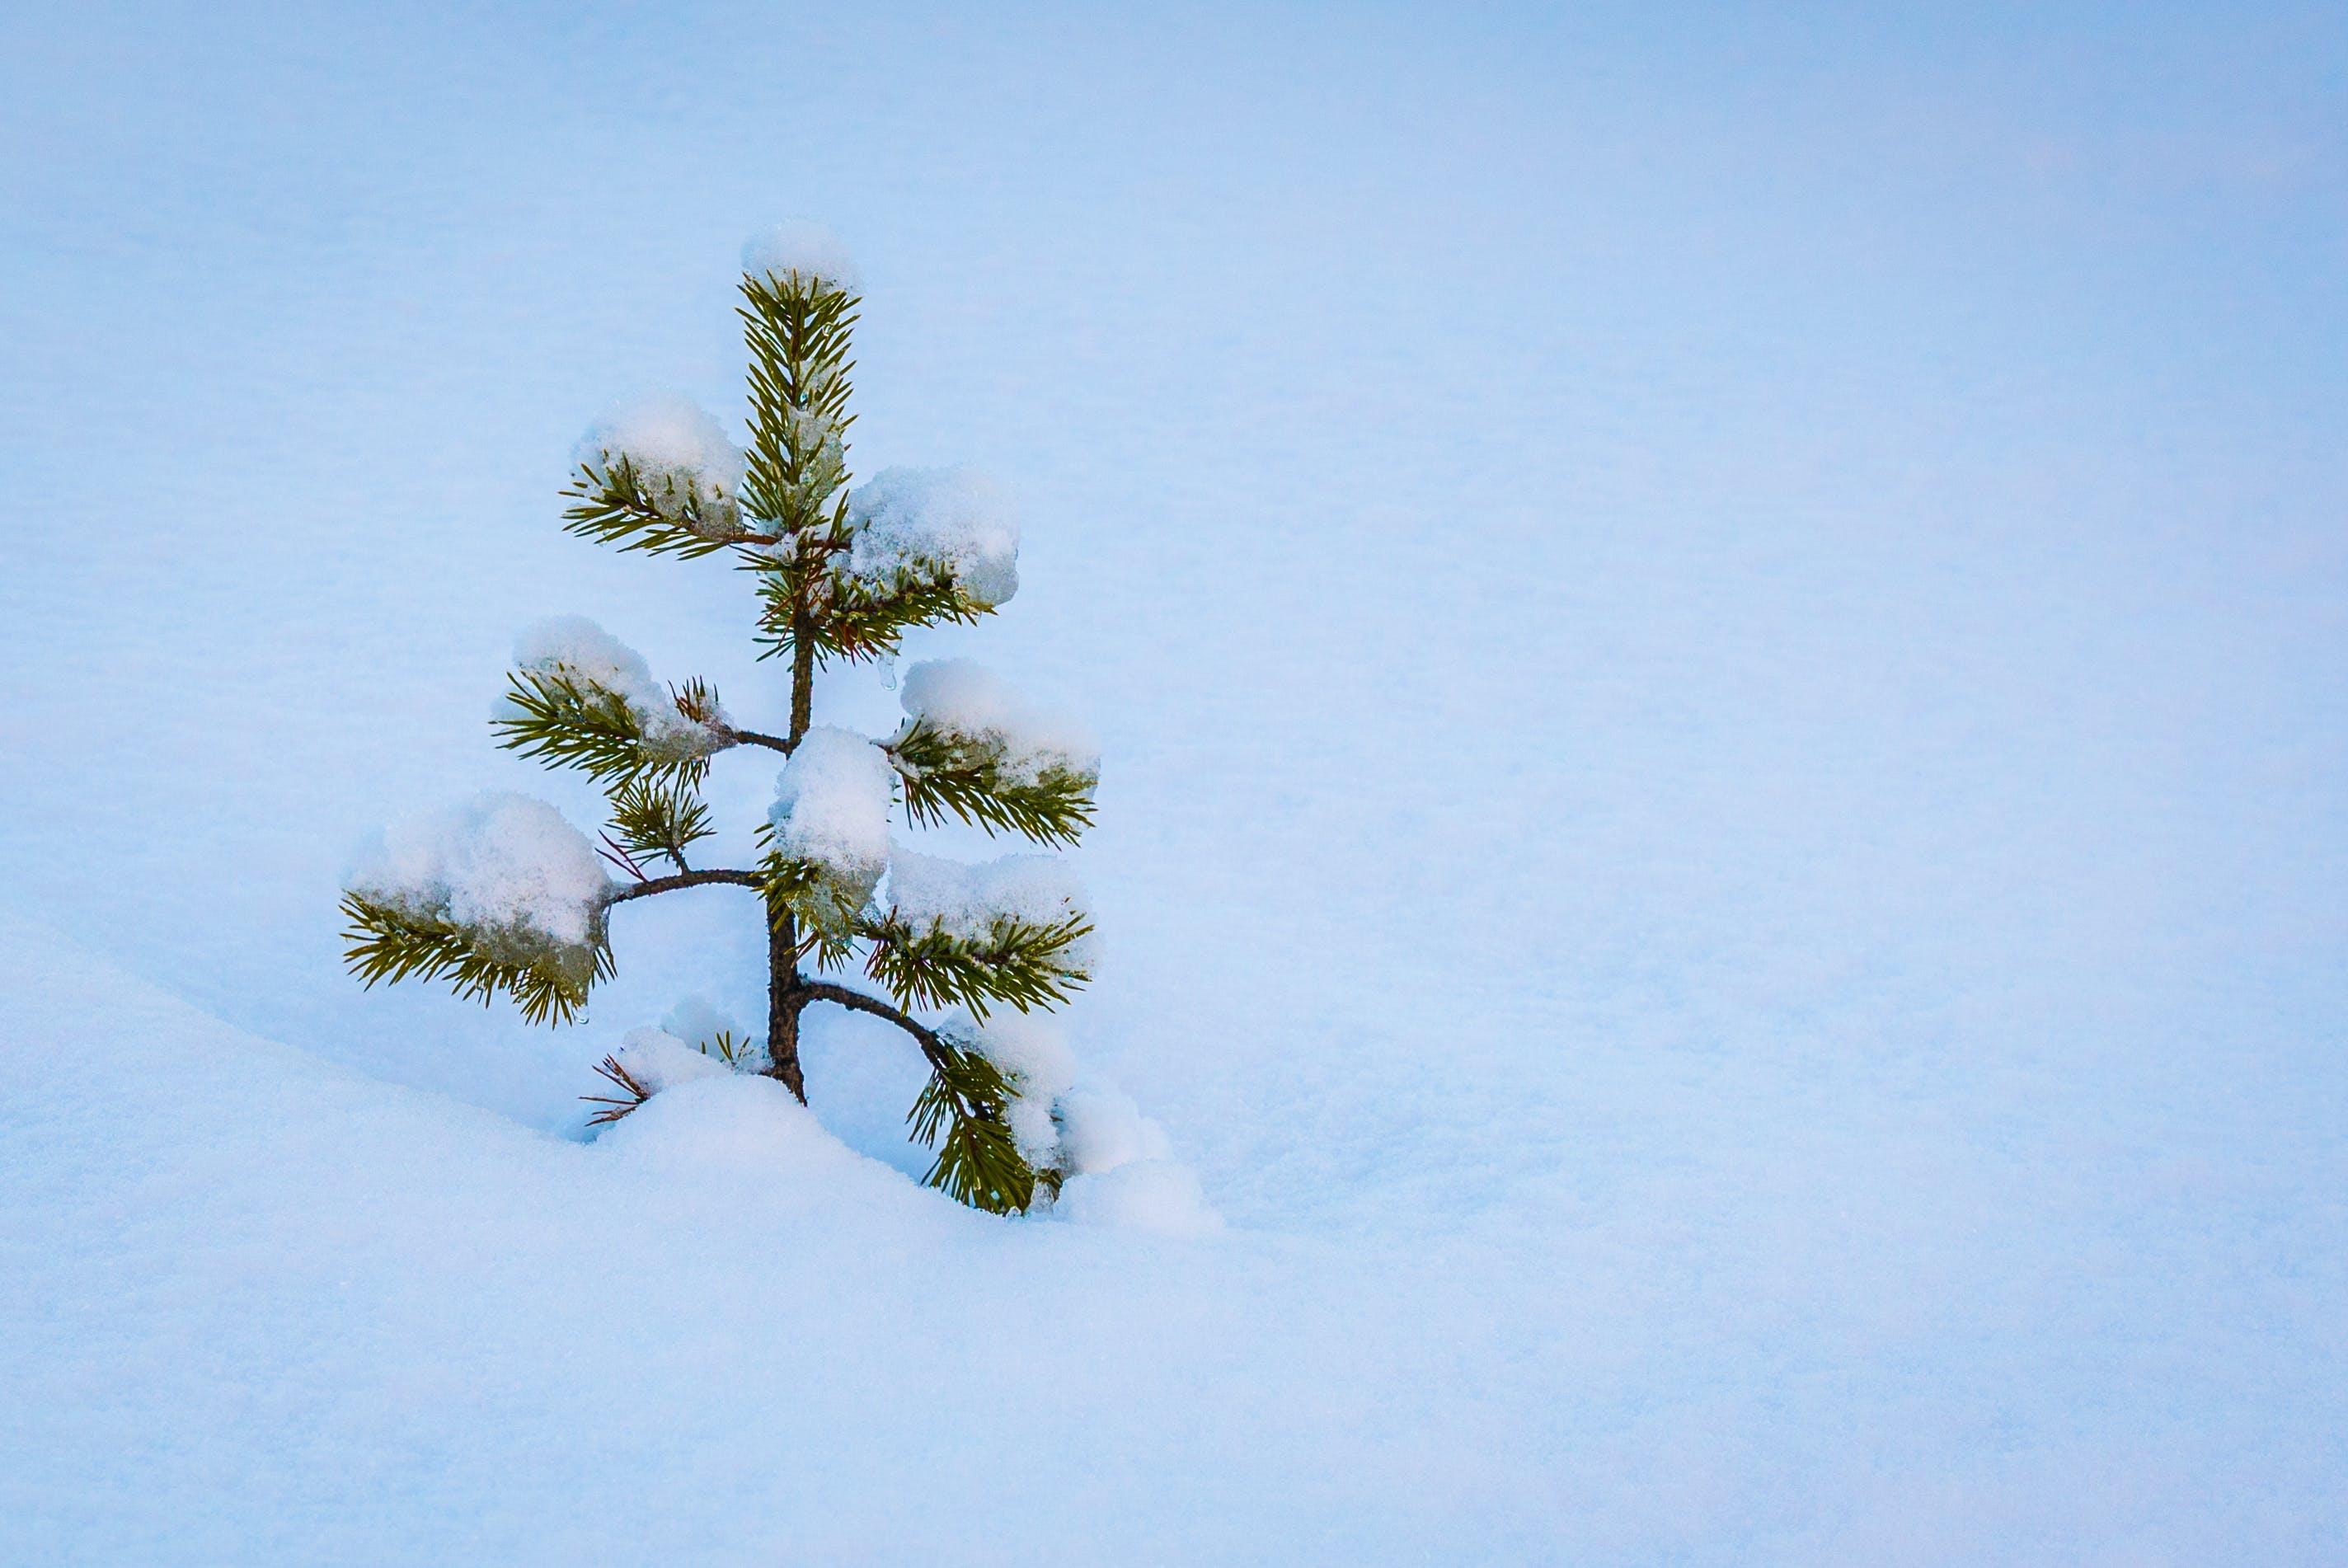 Free stock photo of pine, snow